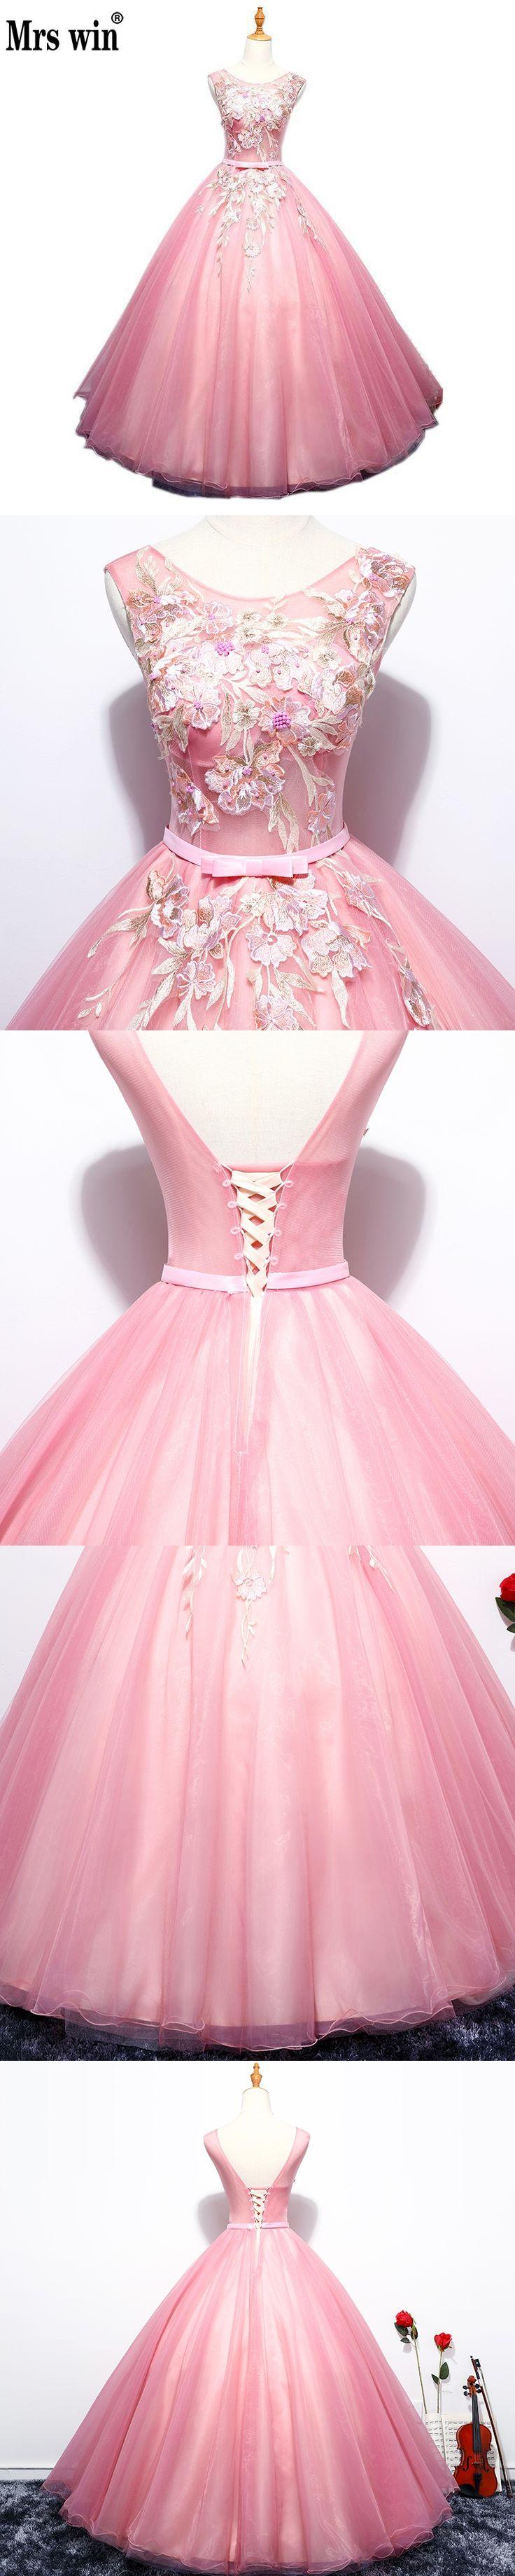 Mejores 68 imágenes de Quinceanera Dresses en Pinterest